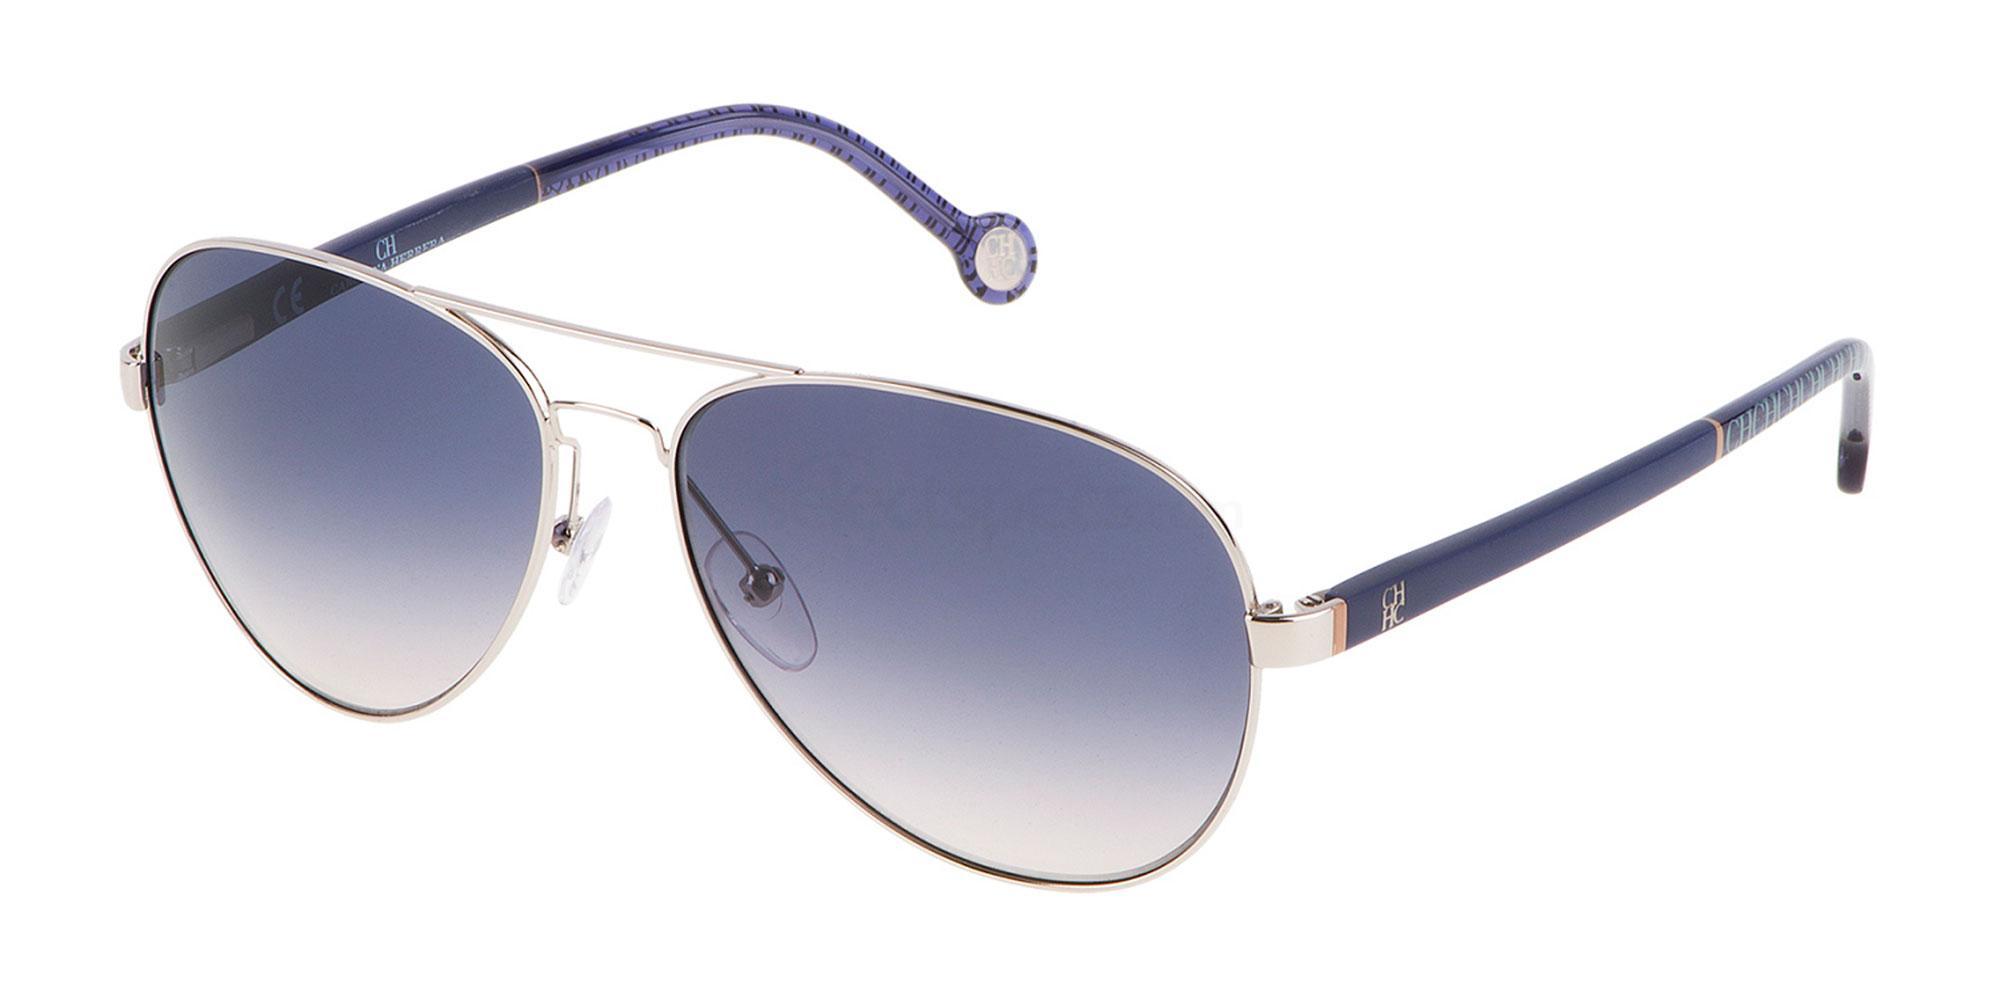 0579 SHE070 Sunglasses, CH Carolina Herrera